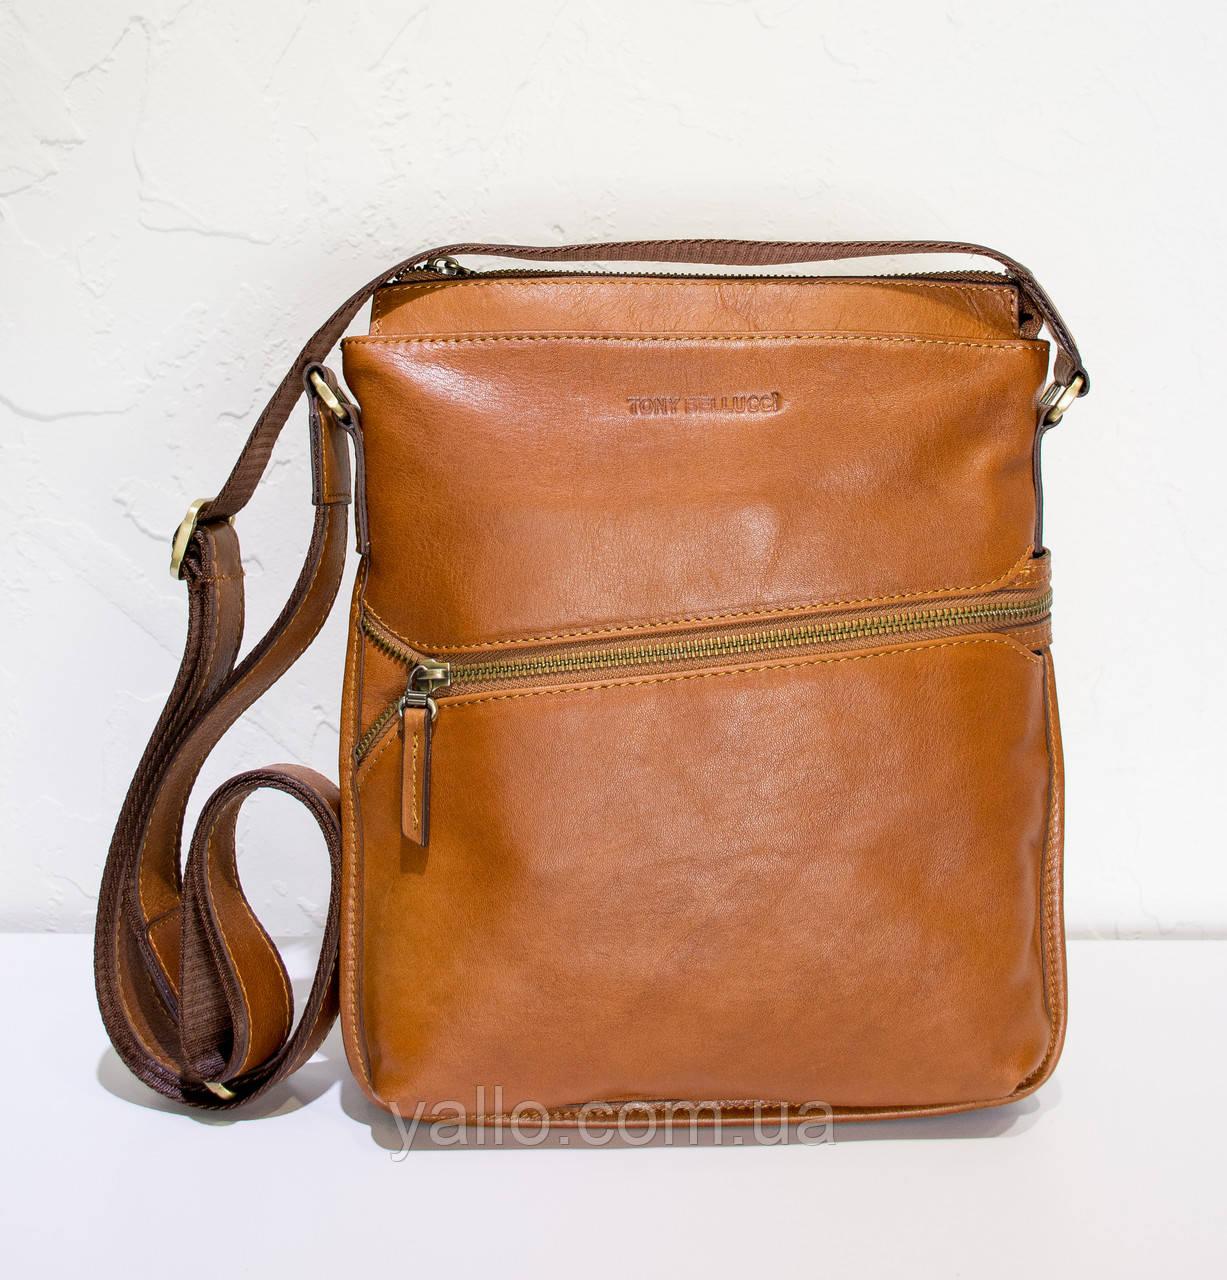 d077365b87e9 Натуральная кожаная сумка для мужчин Tony Bellucci T5029-902 -  Интернет-Магазин